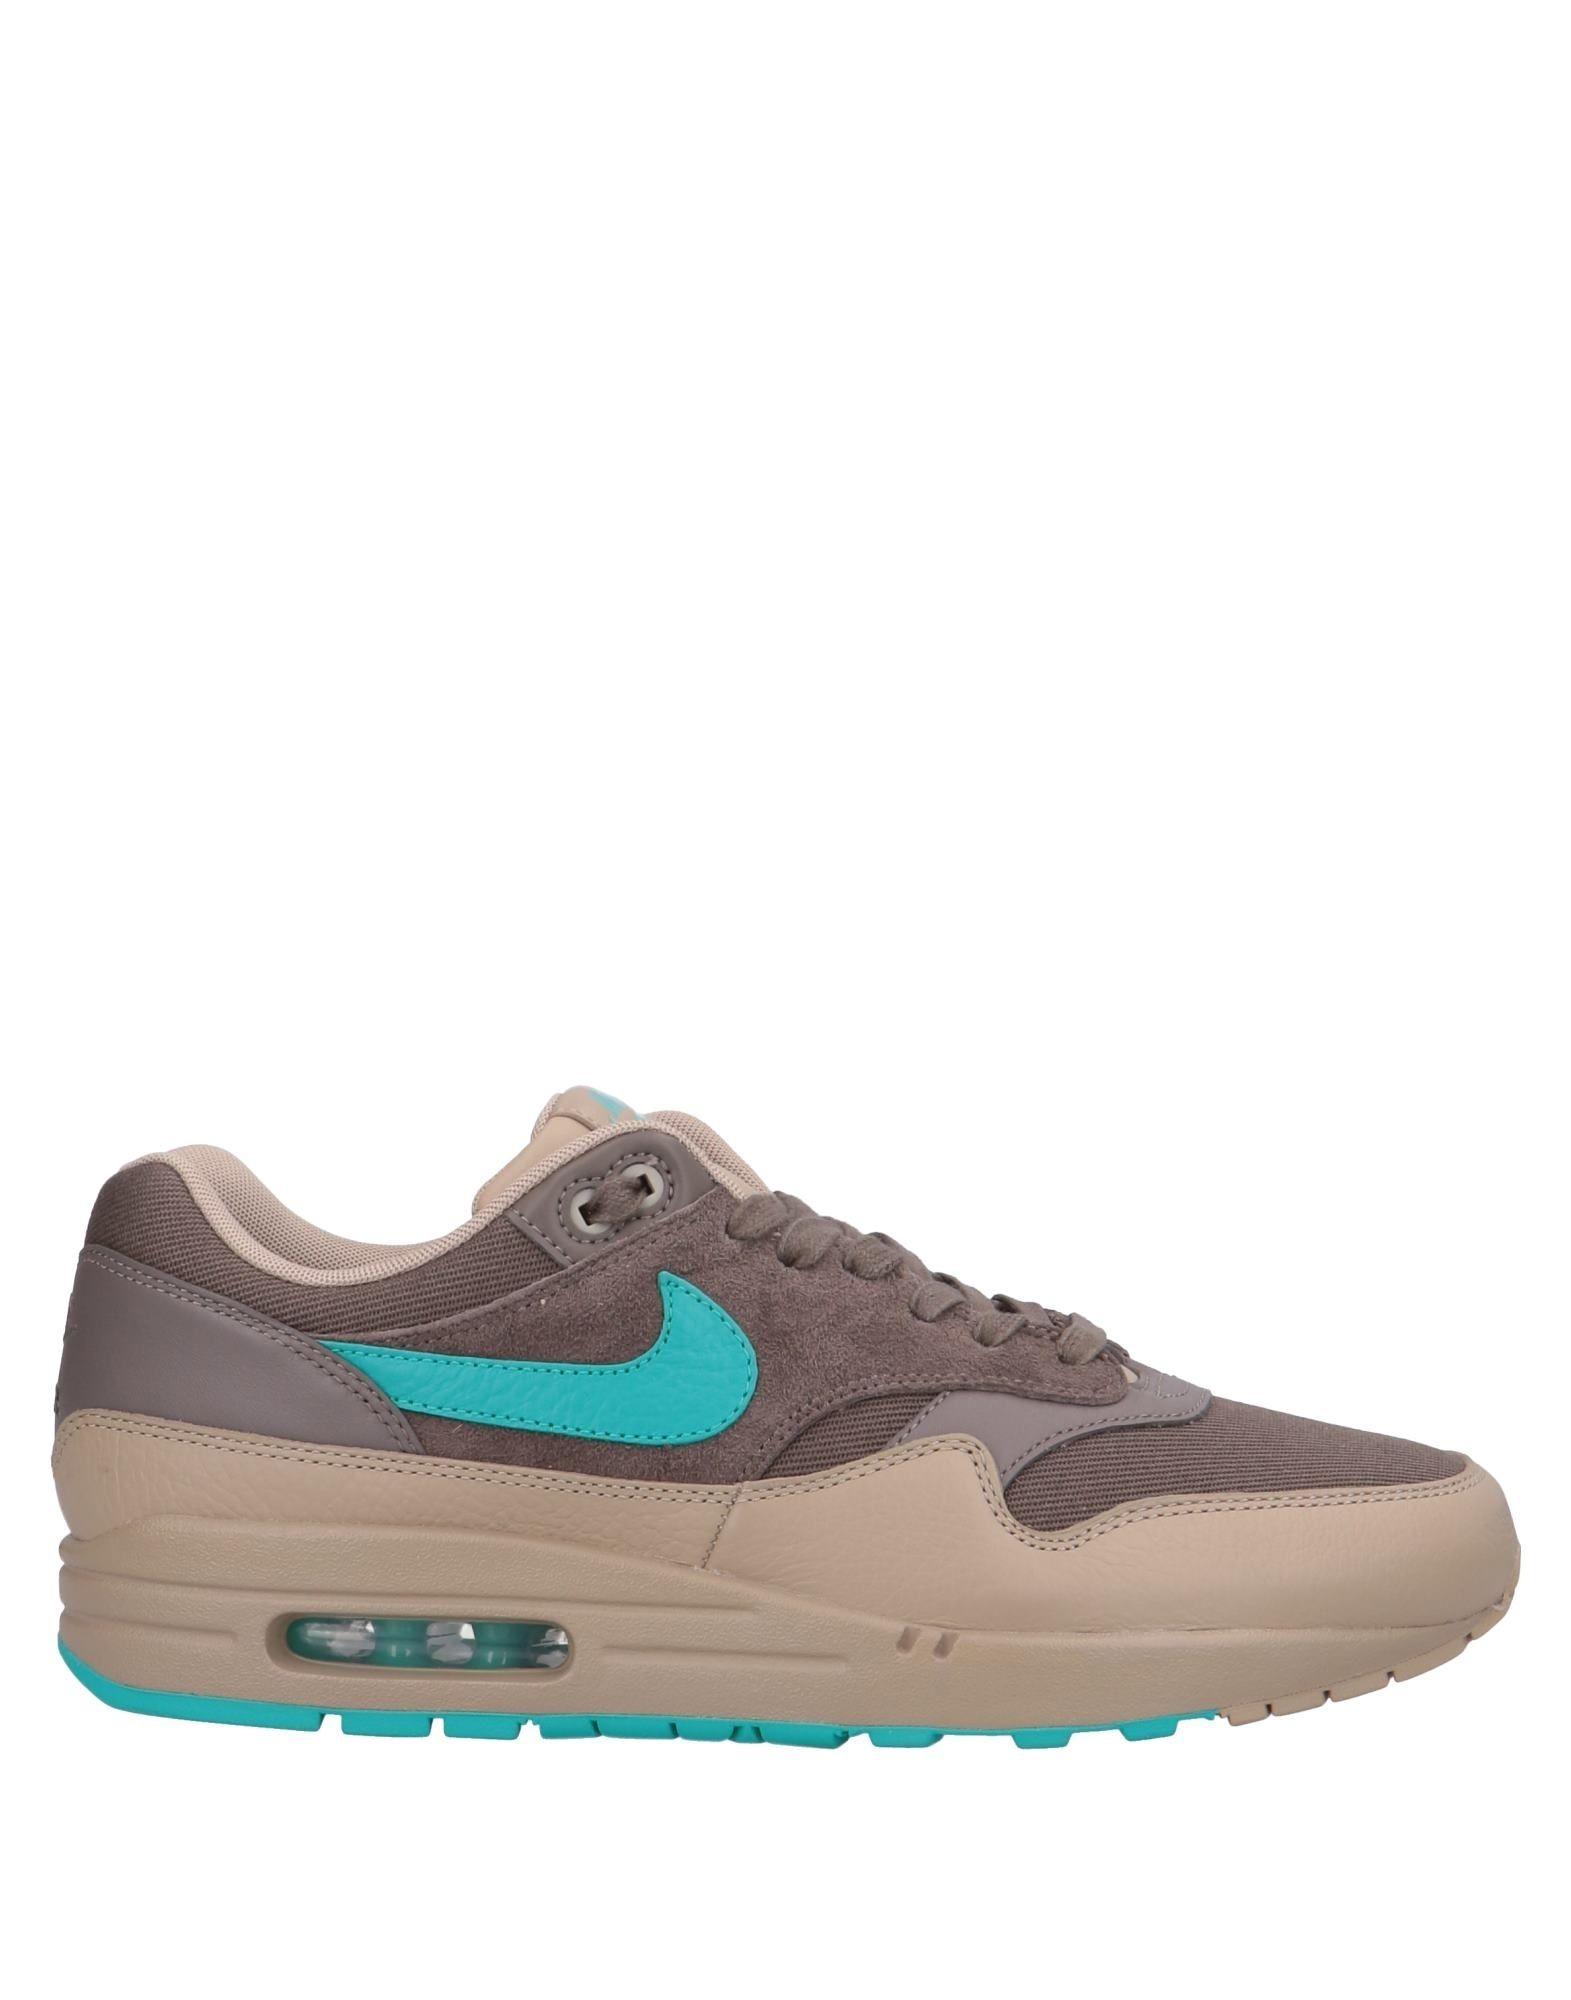 Nike Sneakers Sneakers - Men Nike Sneakers Nike online on  United Kingdom - 11562045FI cabb58